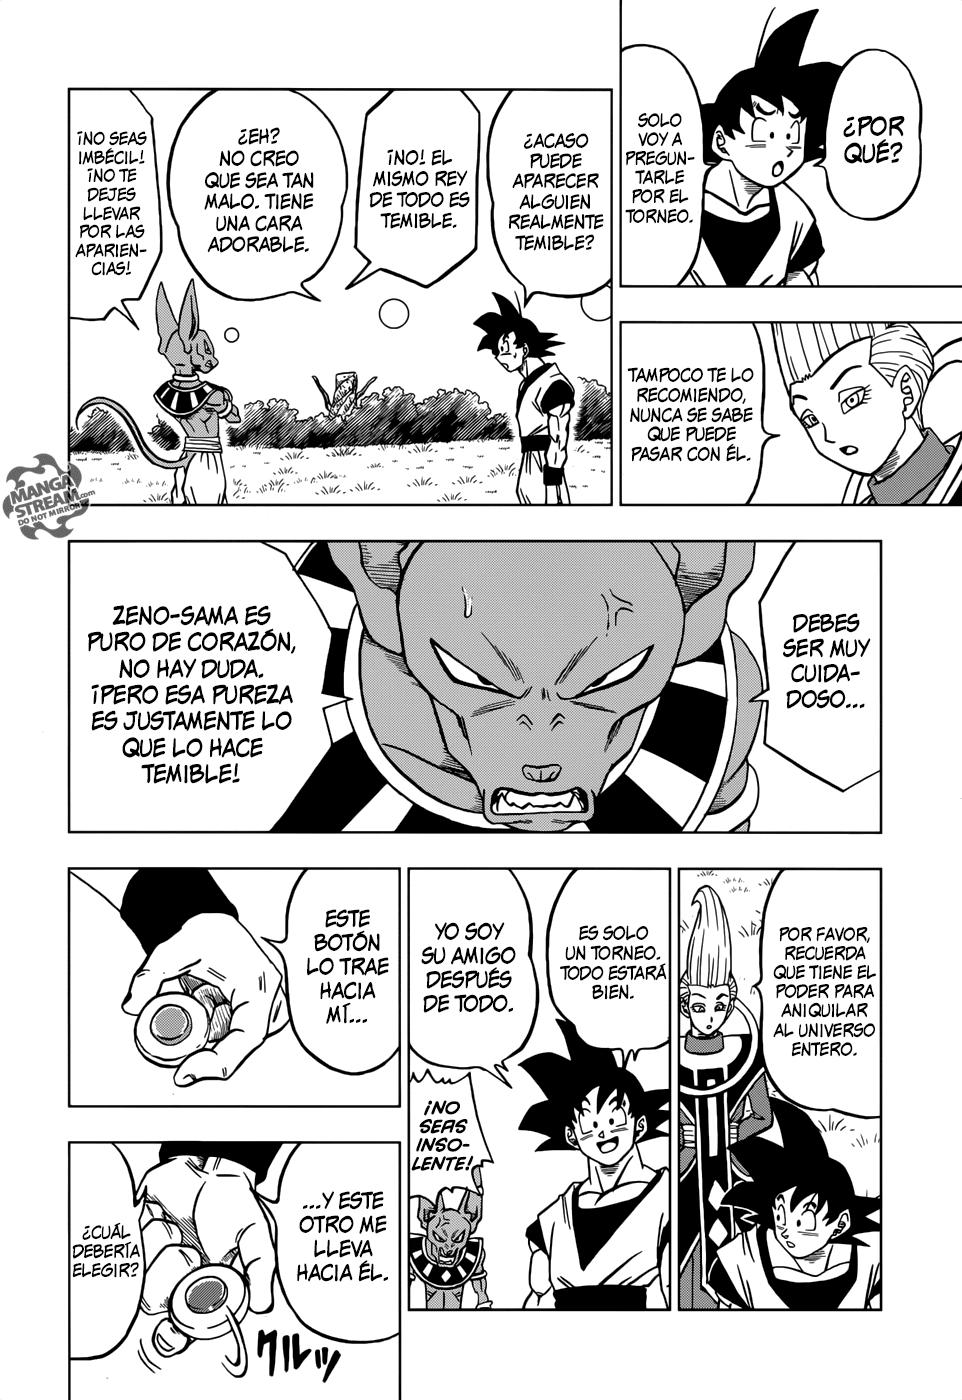 Pagina 44 Manga 27 Dragon Ball Super Dragones Dragon Ball Manga